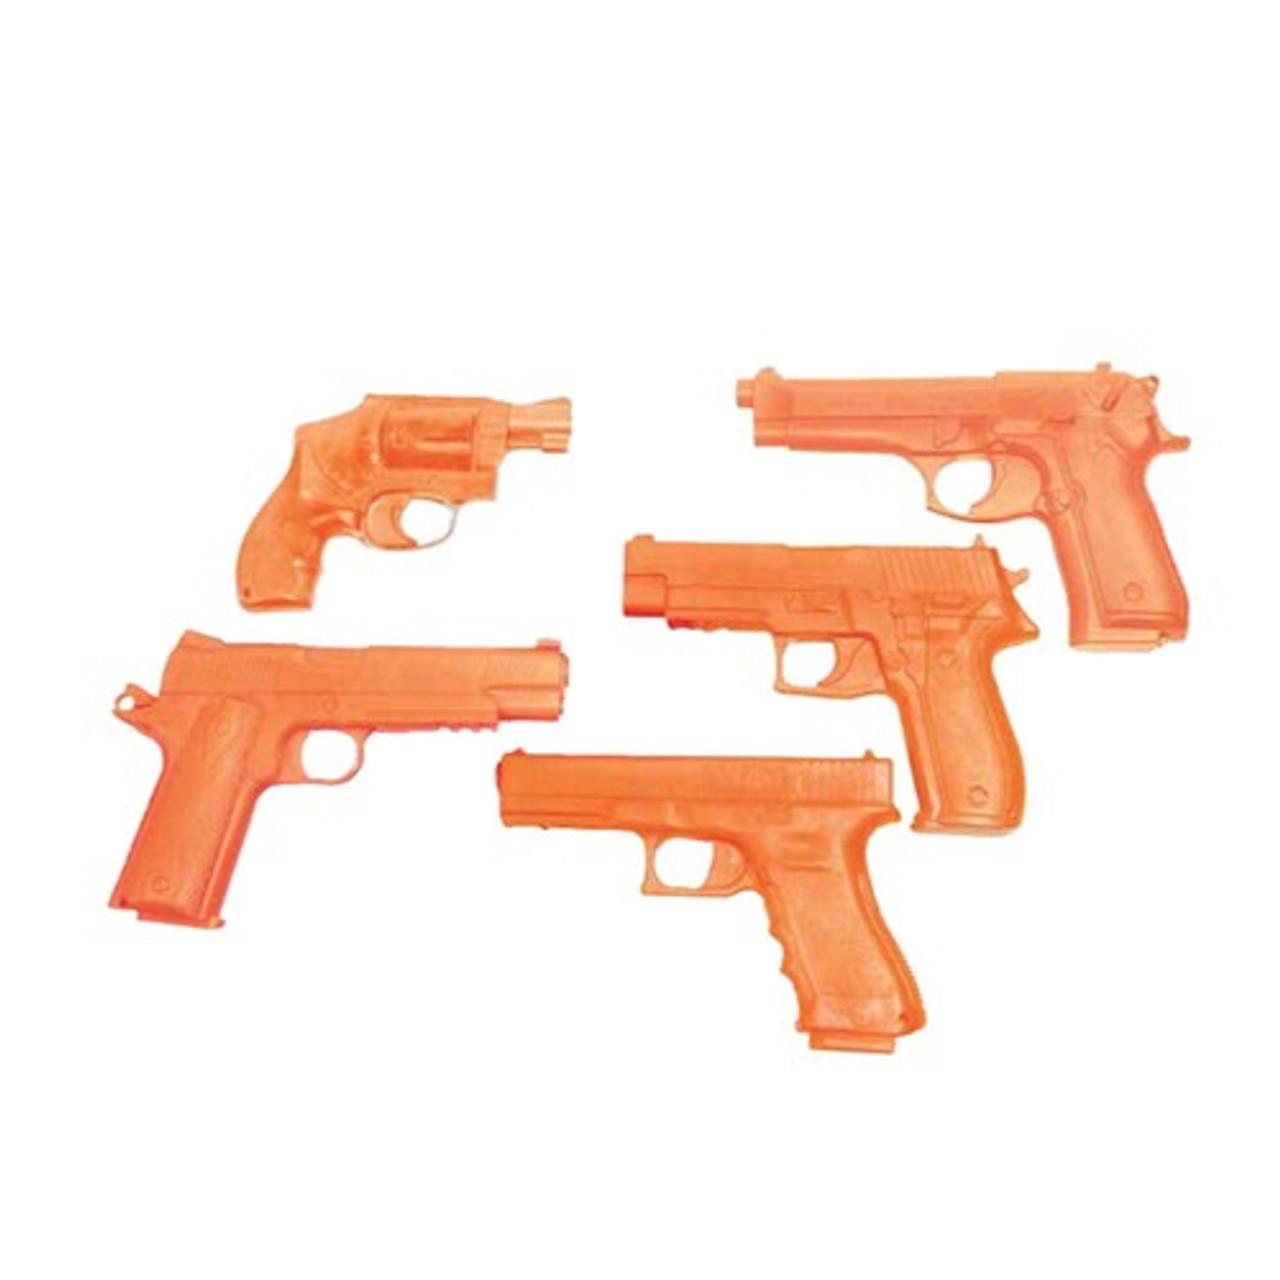 BLACKHAWK 44DG DEMONSTRATOR REPLICA GUNS, Exact size of real pistol,  Injection-molded high-strength, glass-filled polymer, Bright Orange